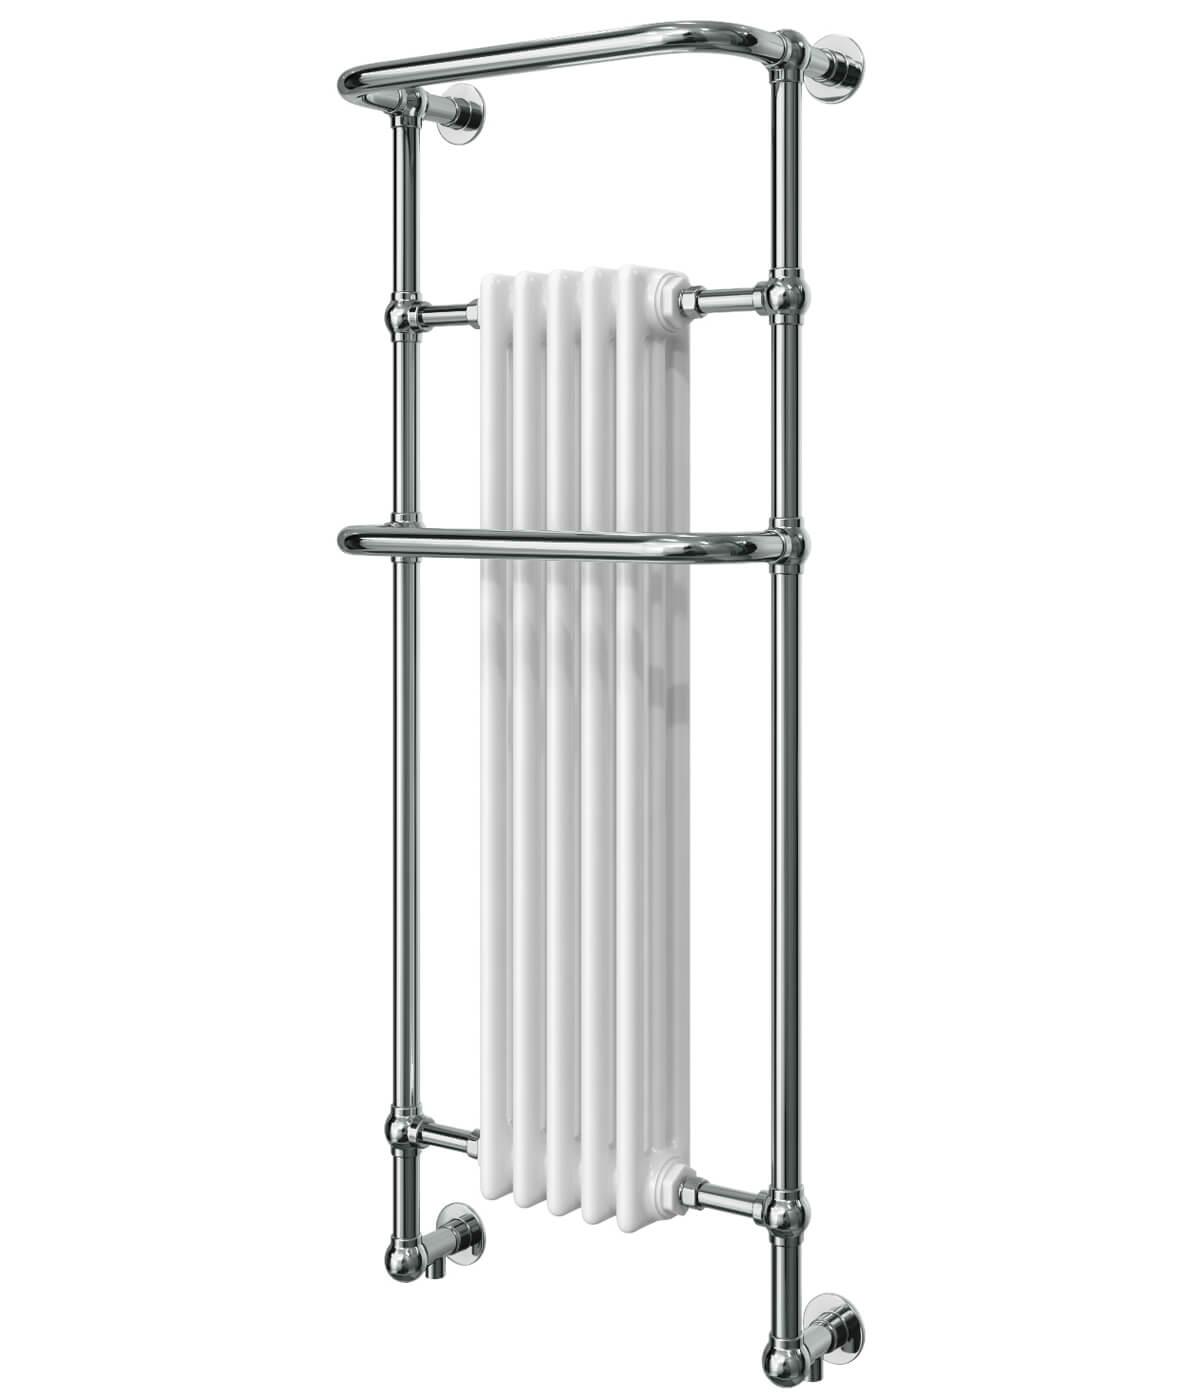 Vogue Regency Tall 575 x 1403mm Traditional Towel Rail